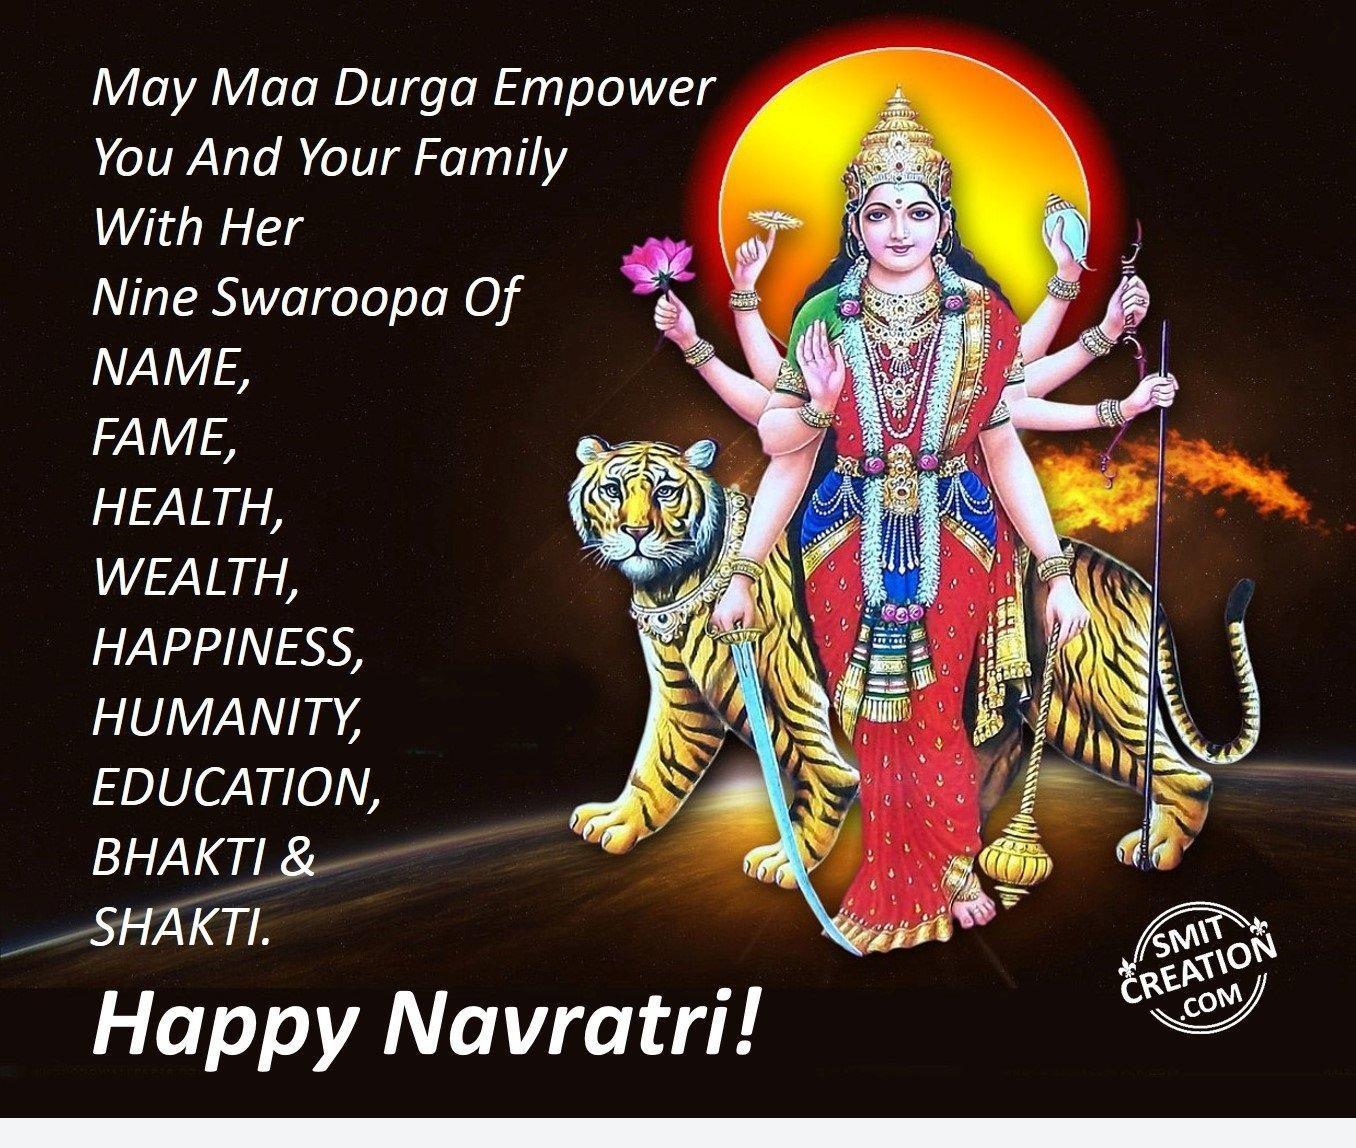 Navratri English Pictures And Graphics Smitcreation